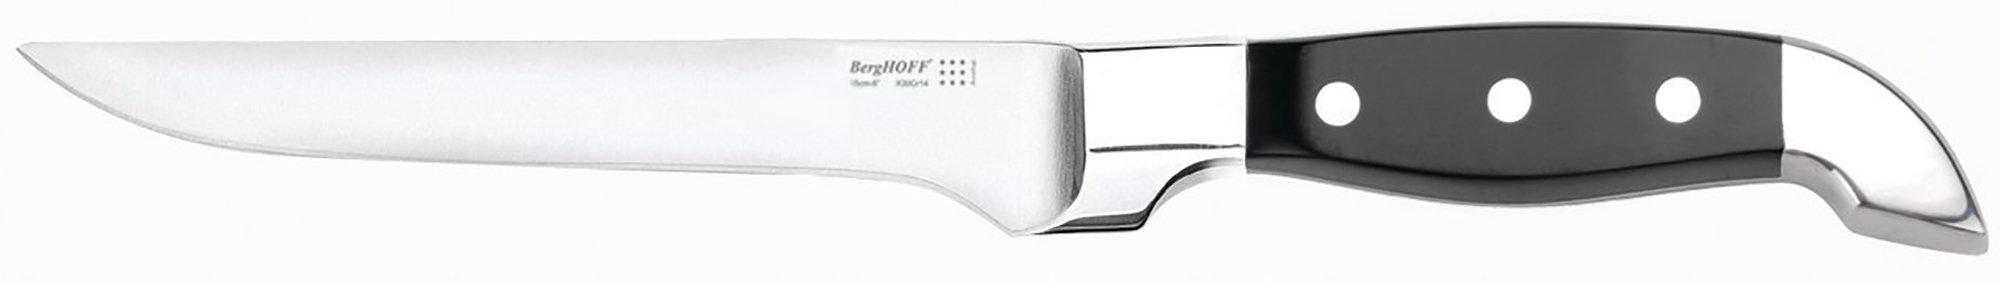 BergHOFF Orion 6'' Boning Knife